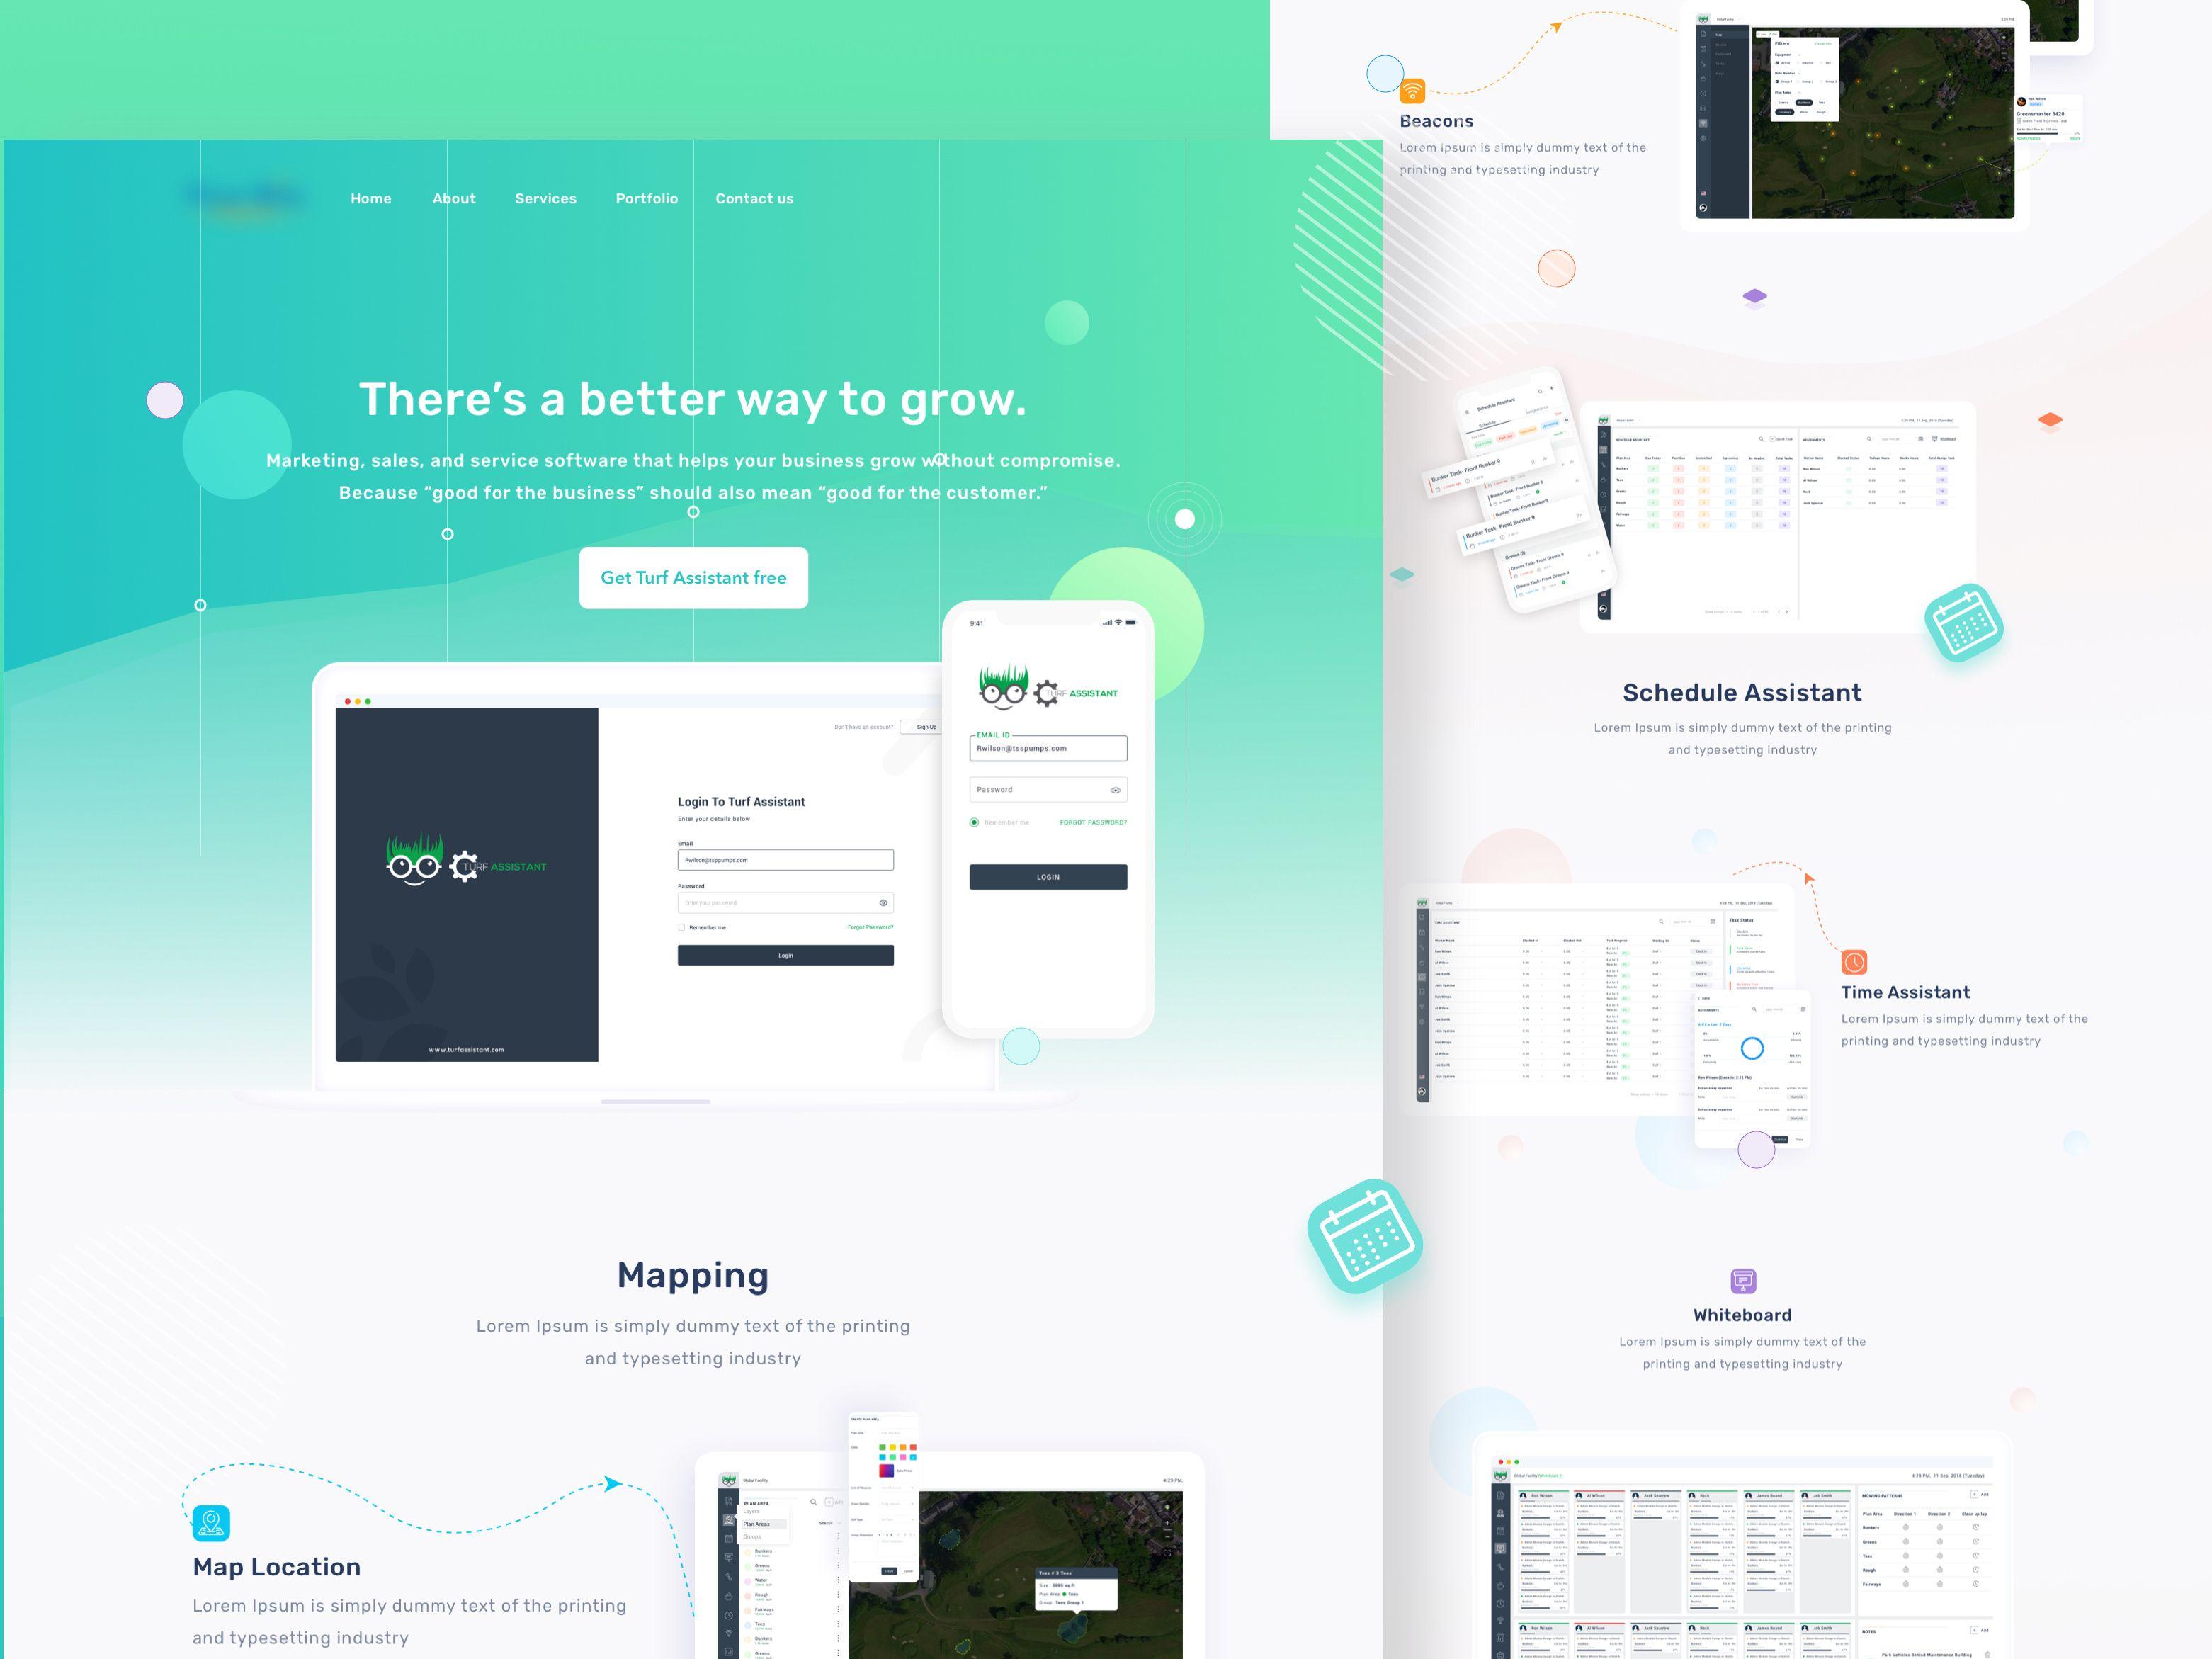 Mockup Landing Page Landing Page Web Design Mockup